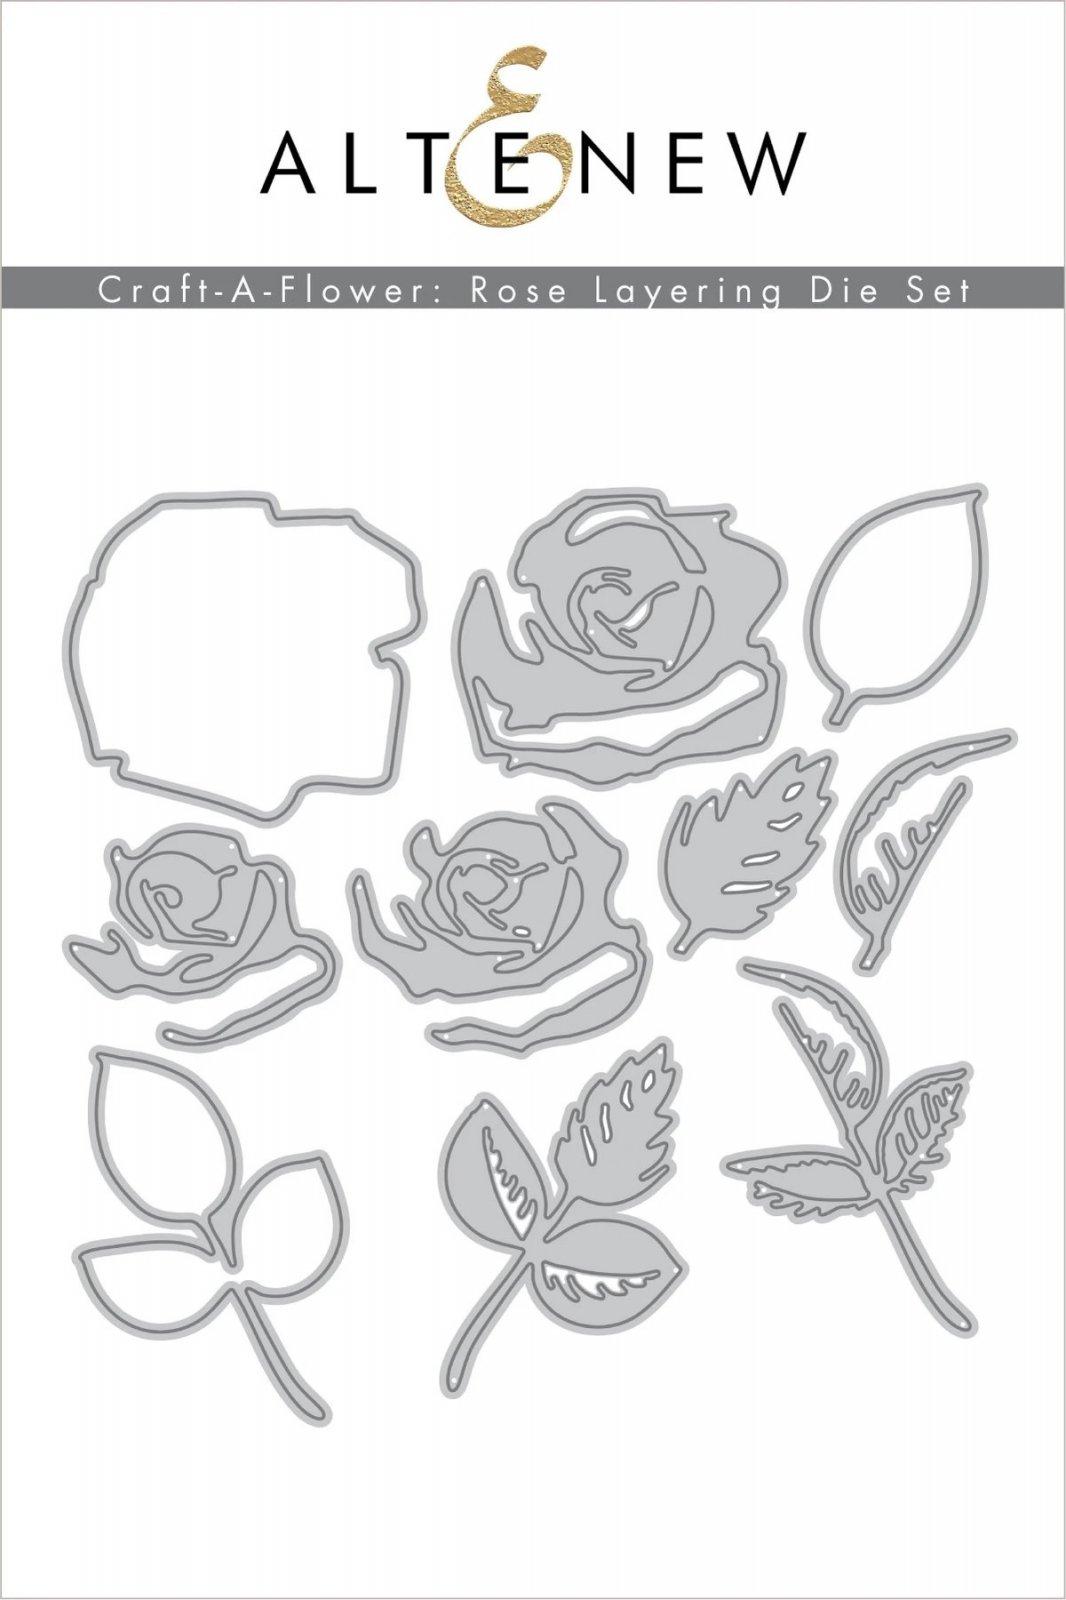 Craft-A-Flower: Rose Layering Die Set